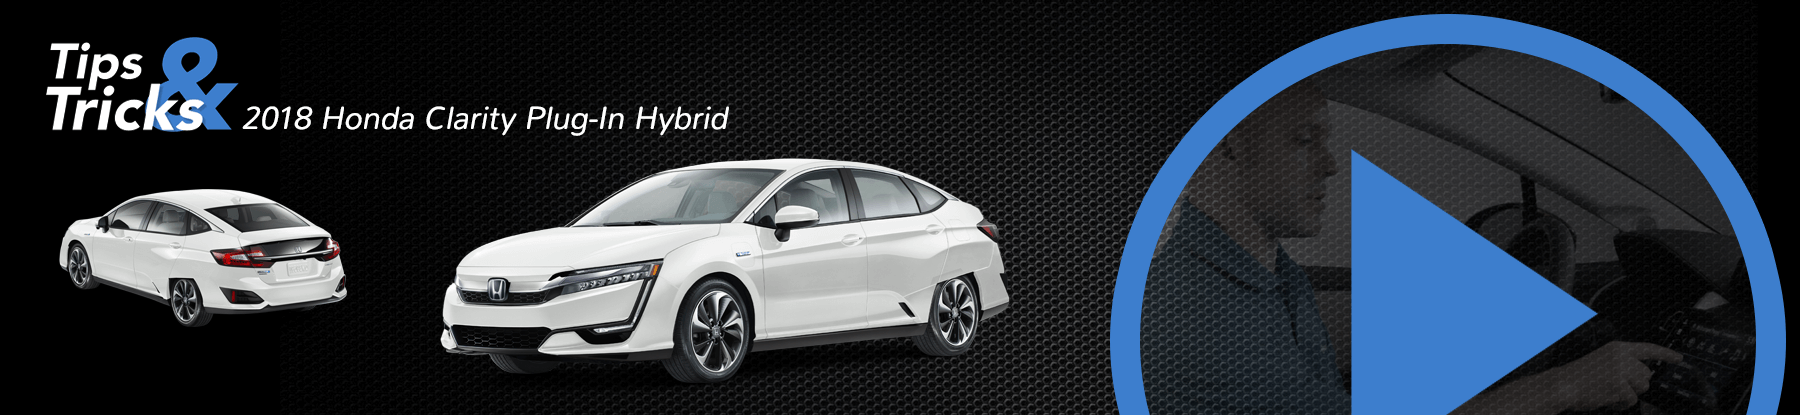 Honda Clarity Plug-In Hybrid Tips and Tricks